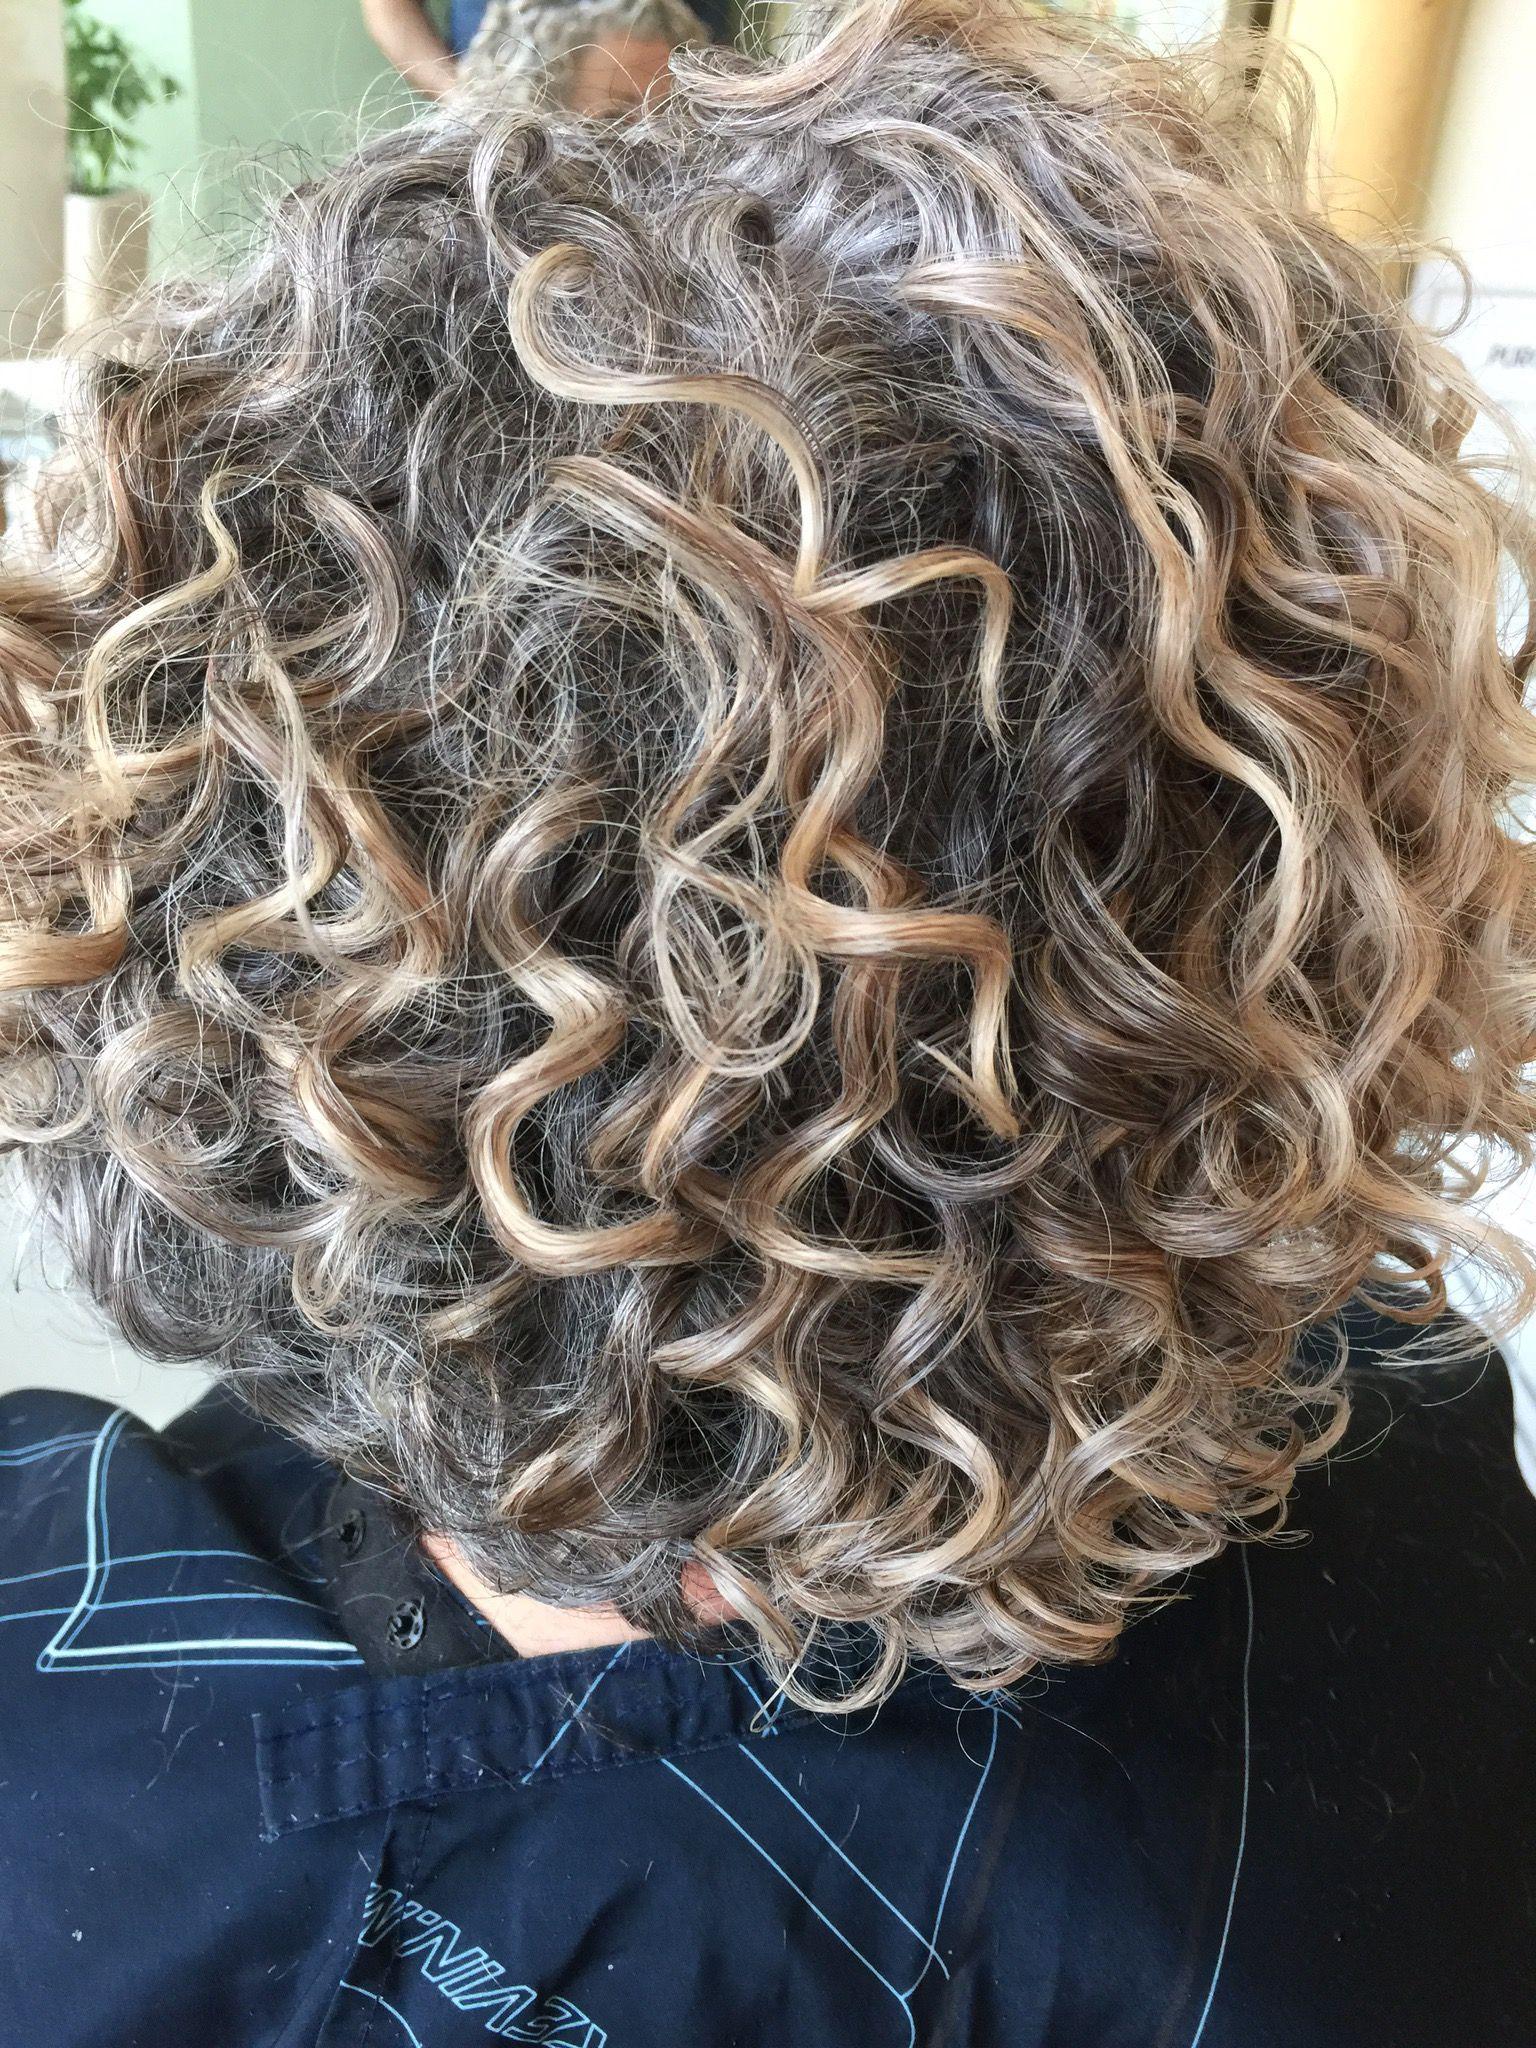 Pin by Kalies DeBerry on Hair | Hair styles, Curls, Hair